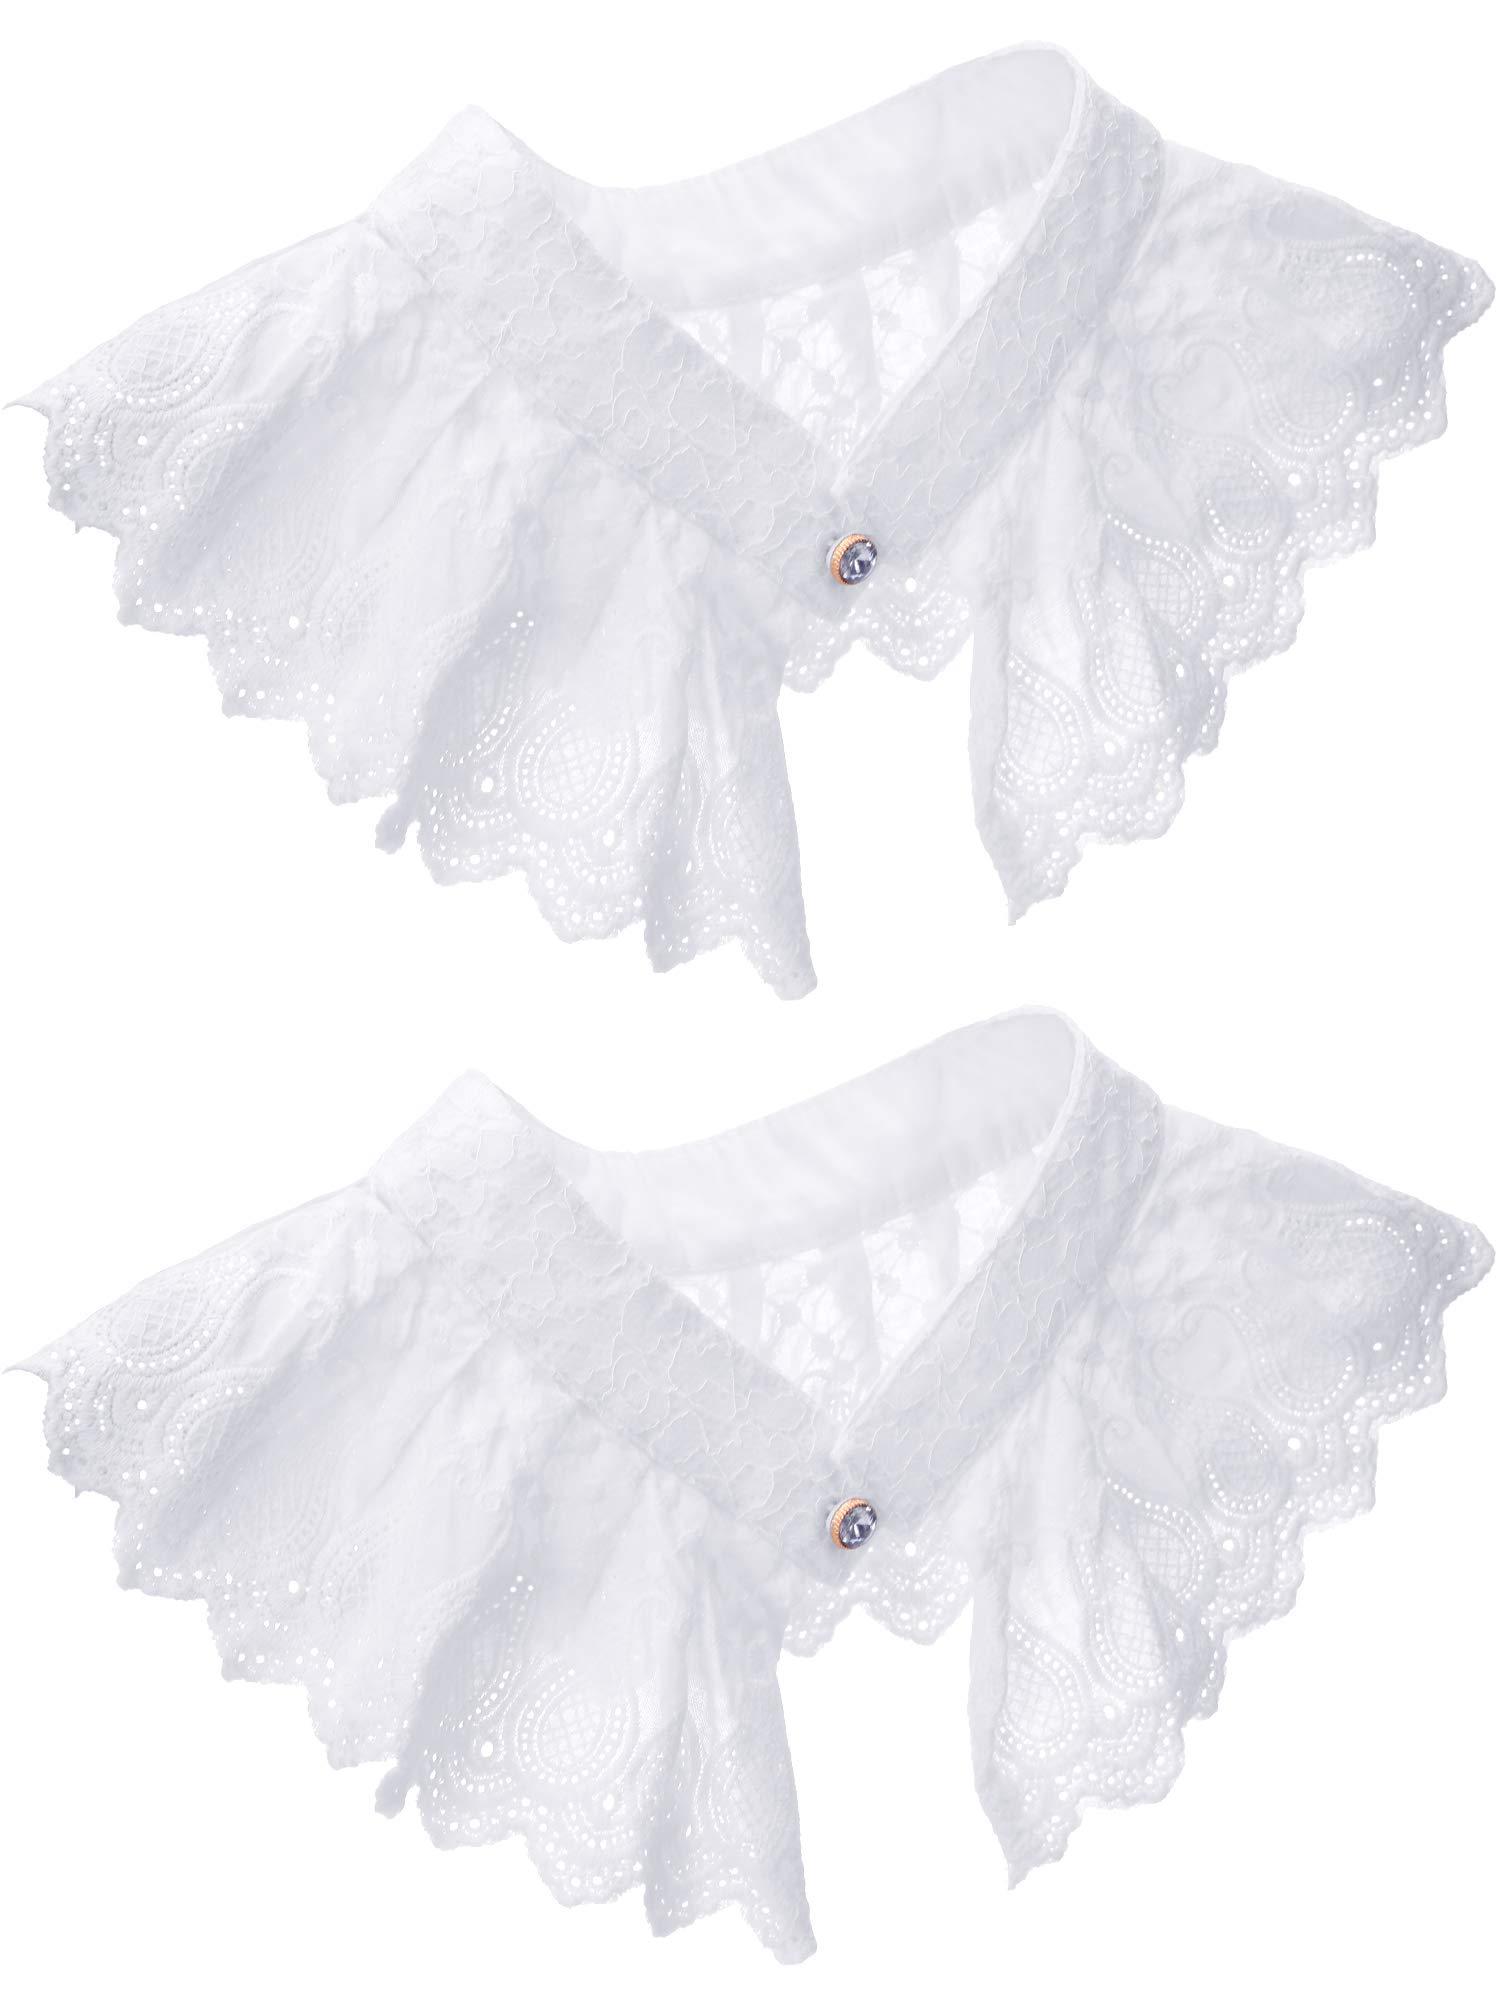 2 Pieces Lace Faux Collar Costume False Lace Collar Decorative Pleated Spread Choker Blouse Collar White